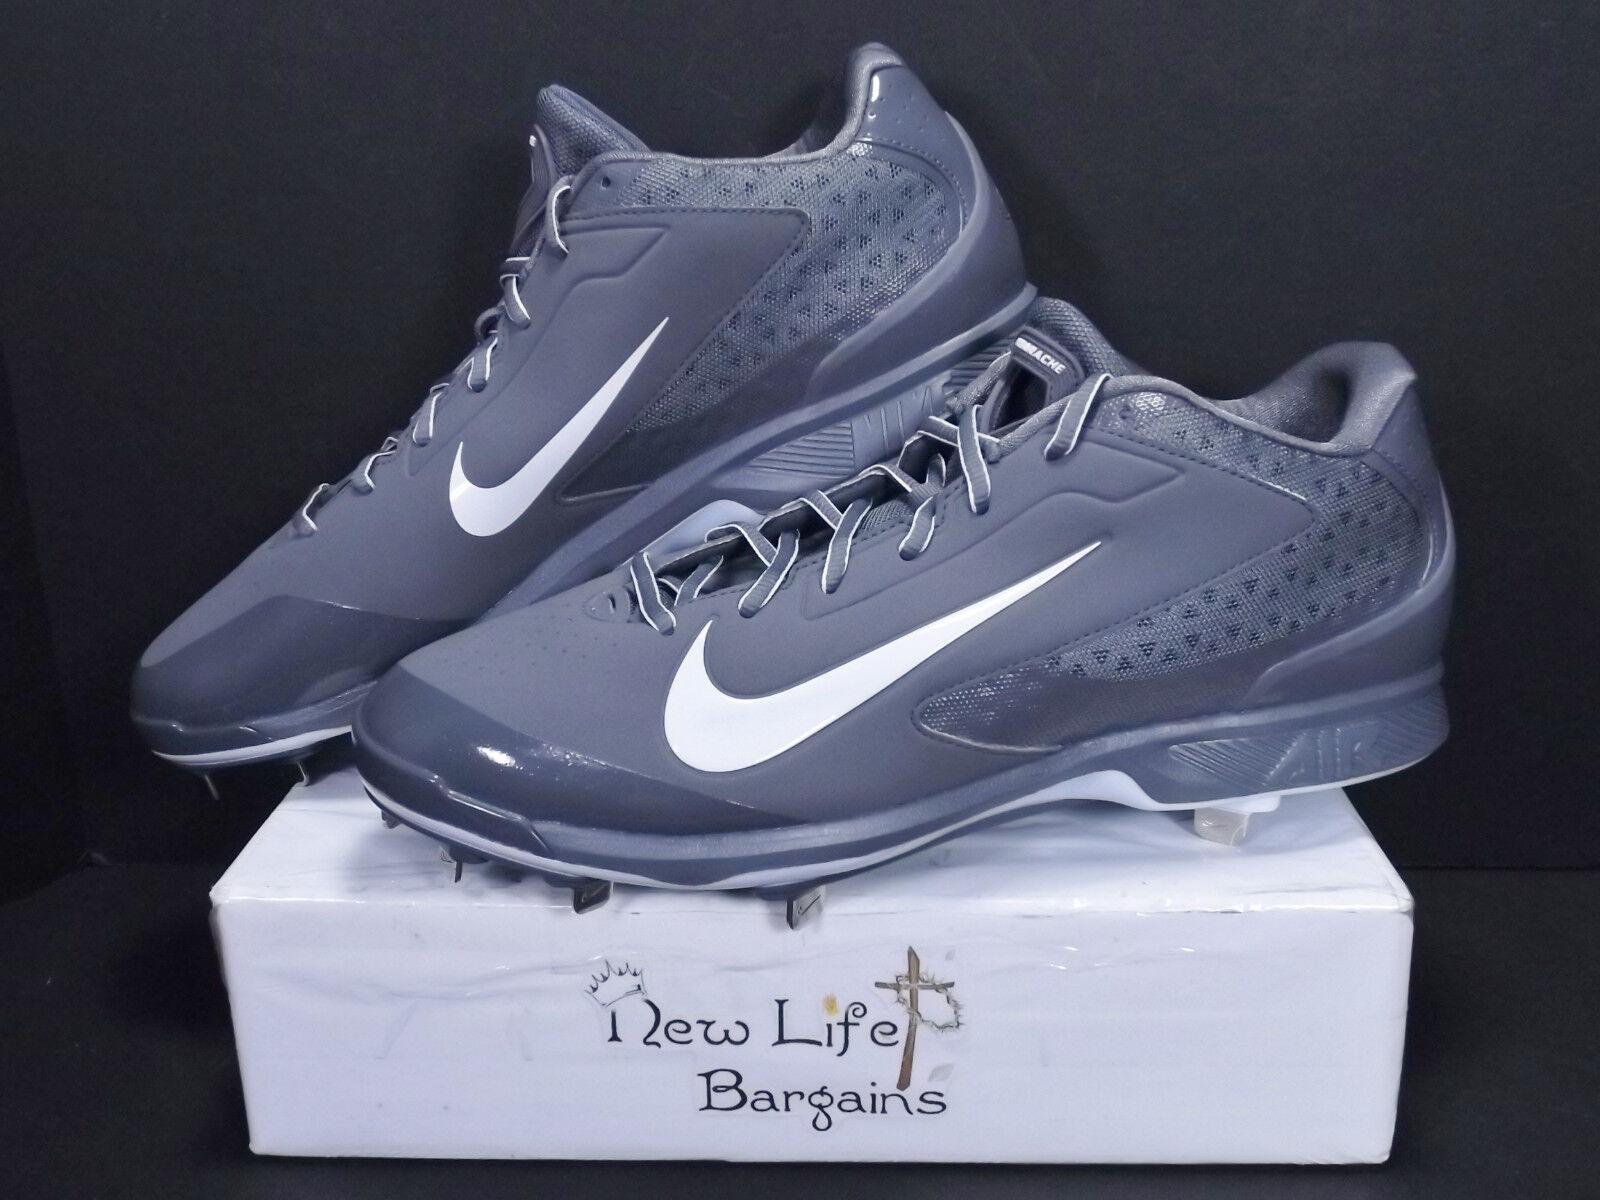 Nike Air Huarache Pro Low Baseball Cleats Men's Comfortable  Great discount